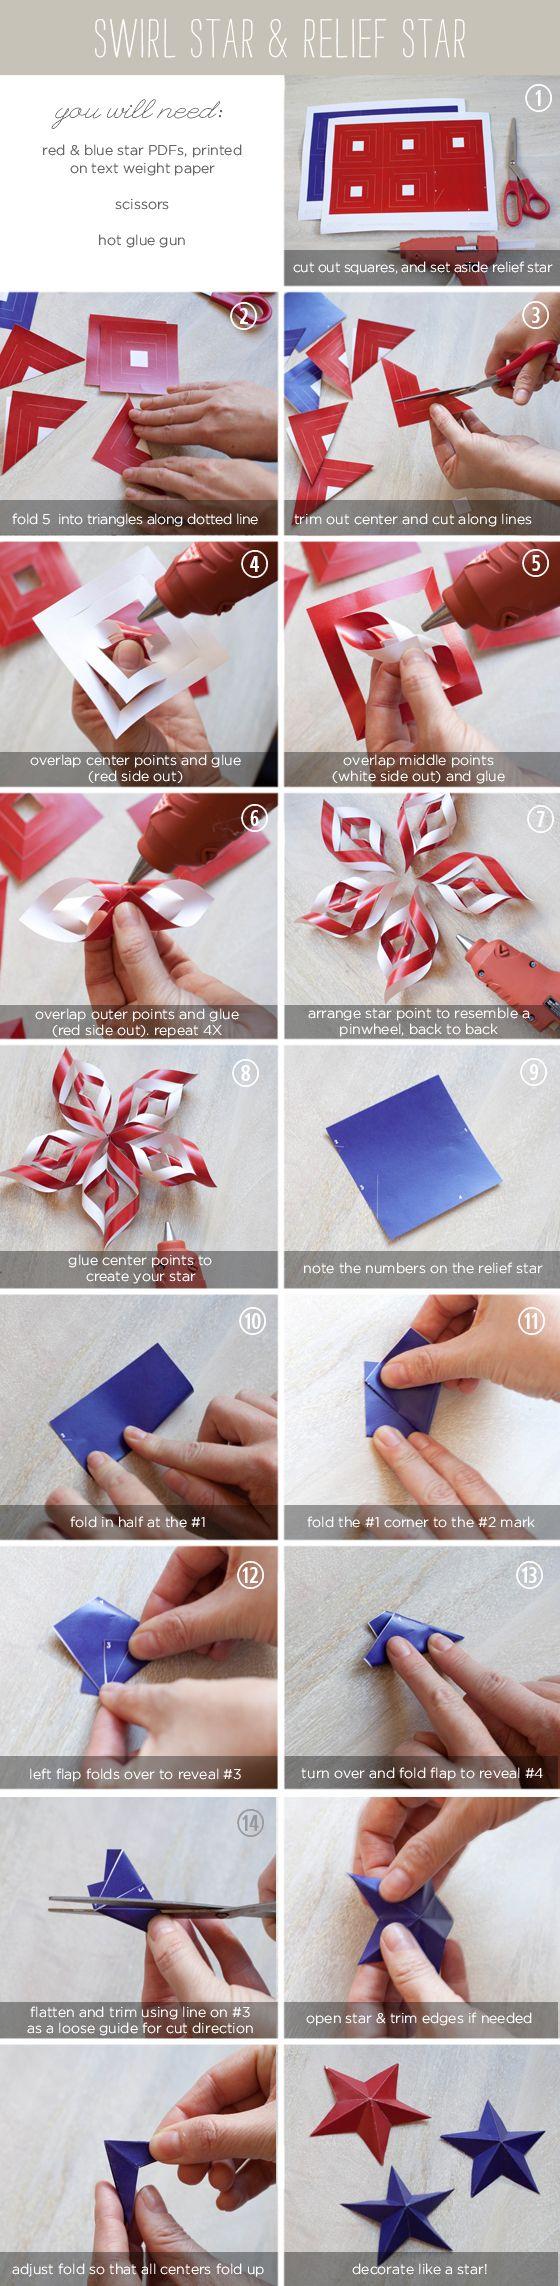 July 4th paper star tutorial kar csony pinterest - Pinterest basteln mit papier ...